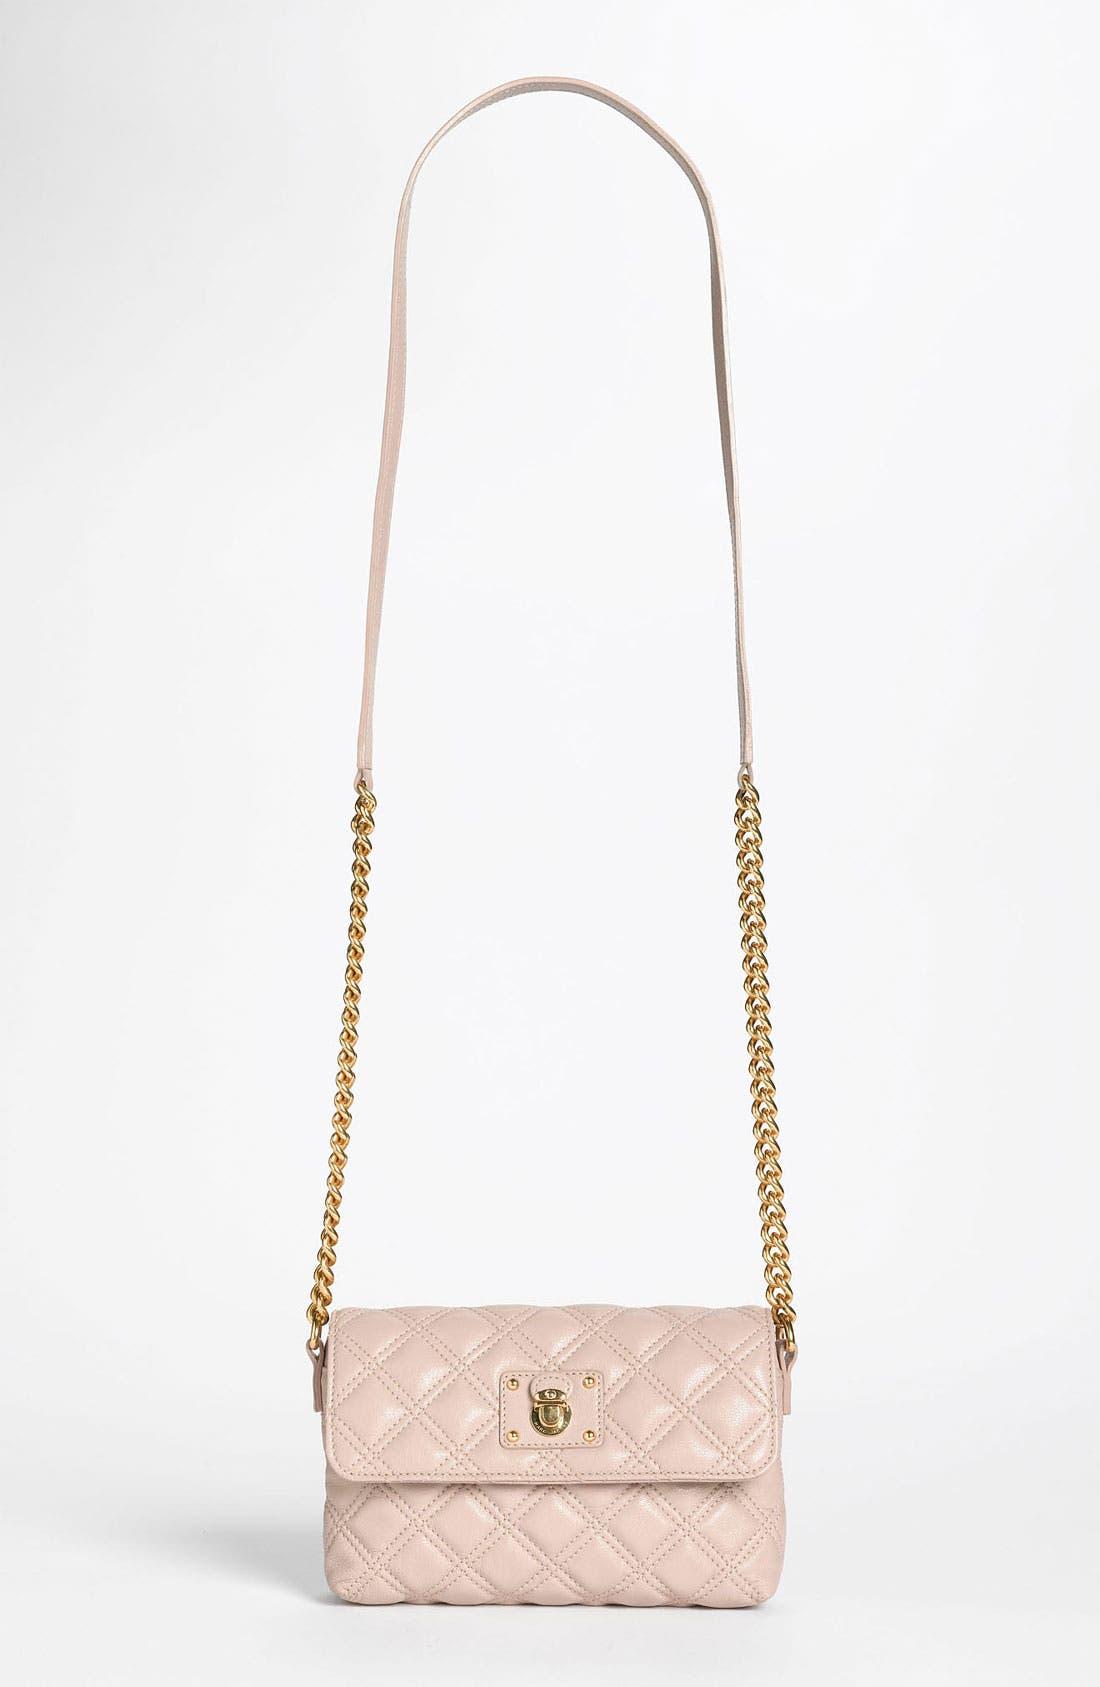 Main Image - MARC JACOBS 'Quilting - Single' Leather Shoulder Bag